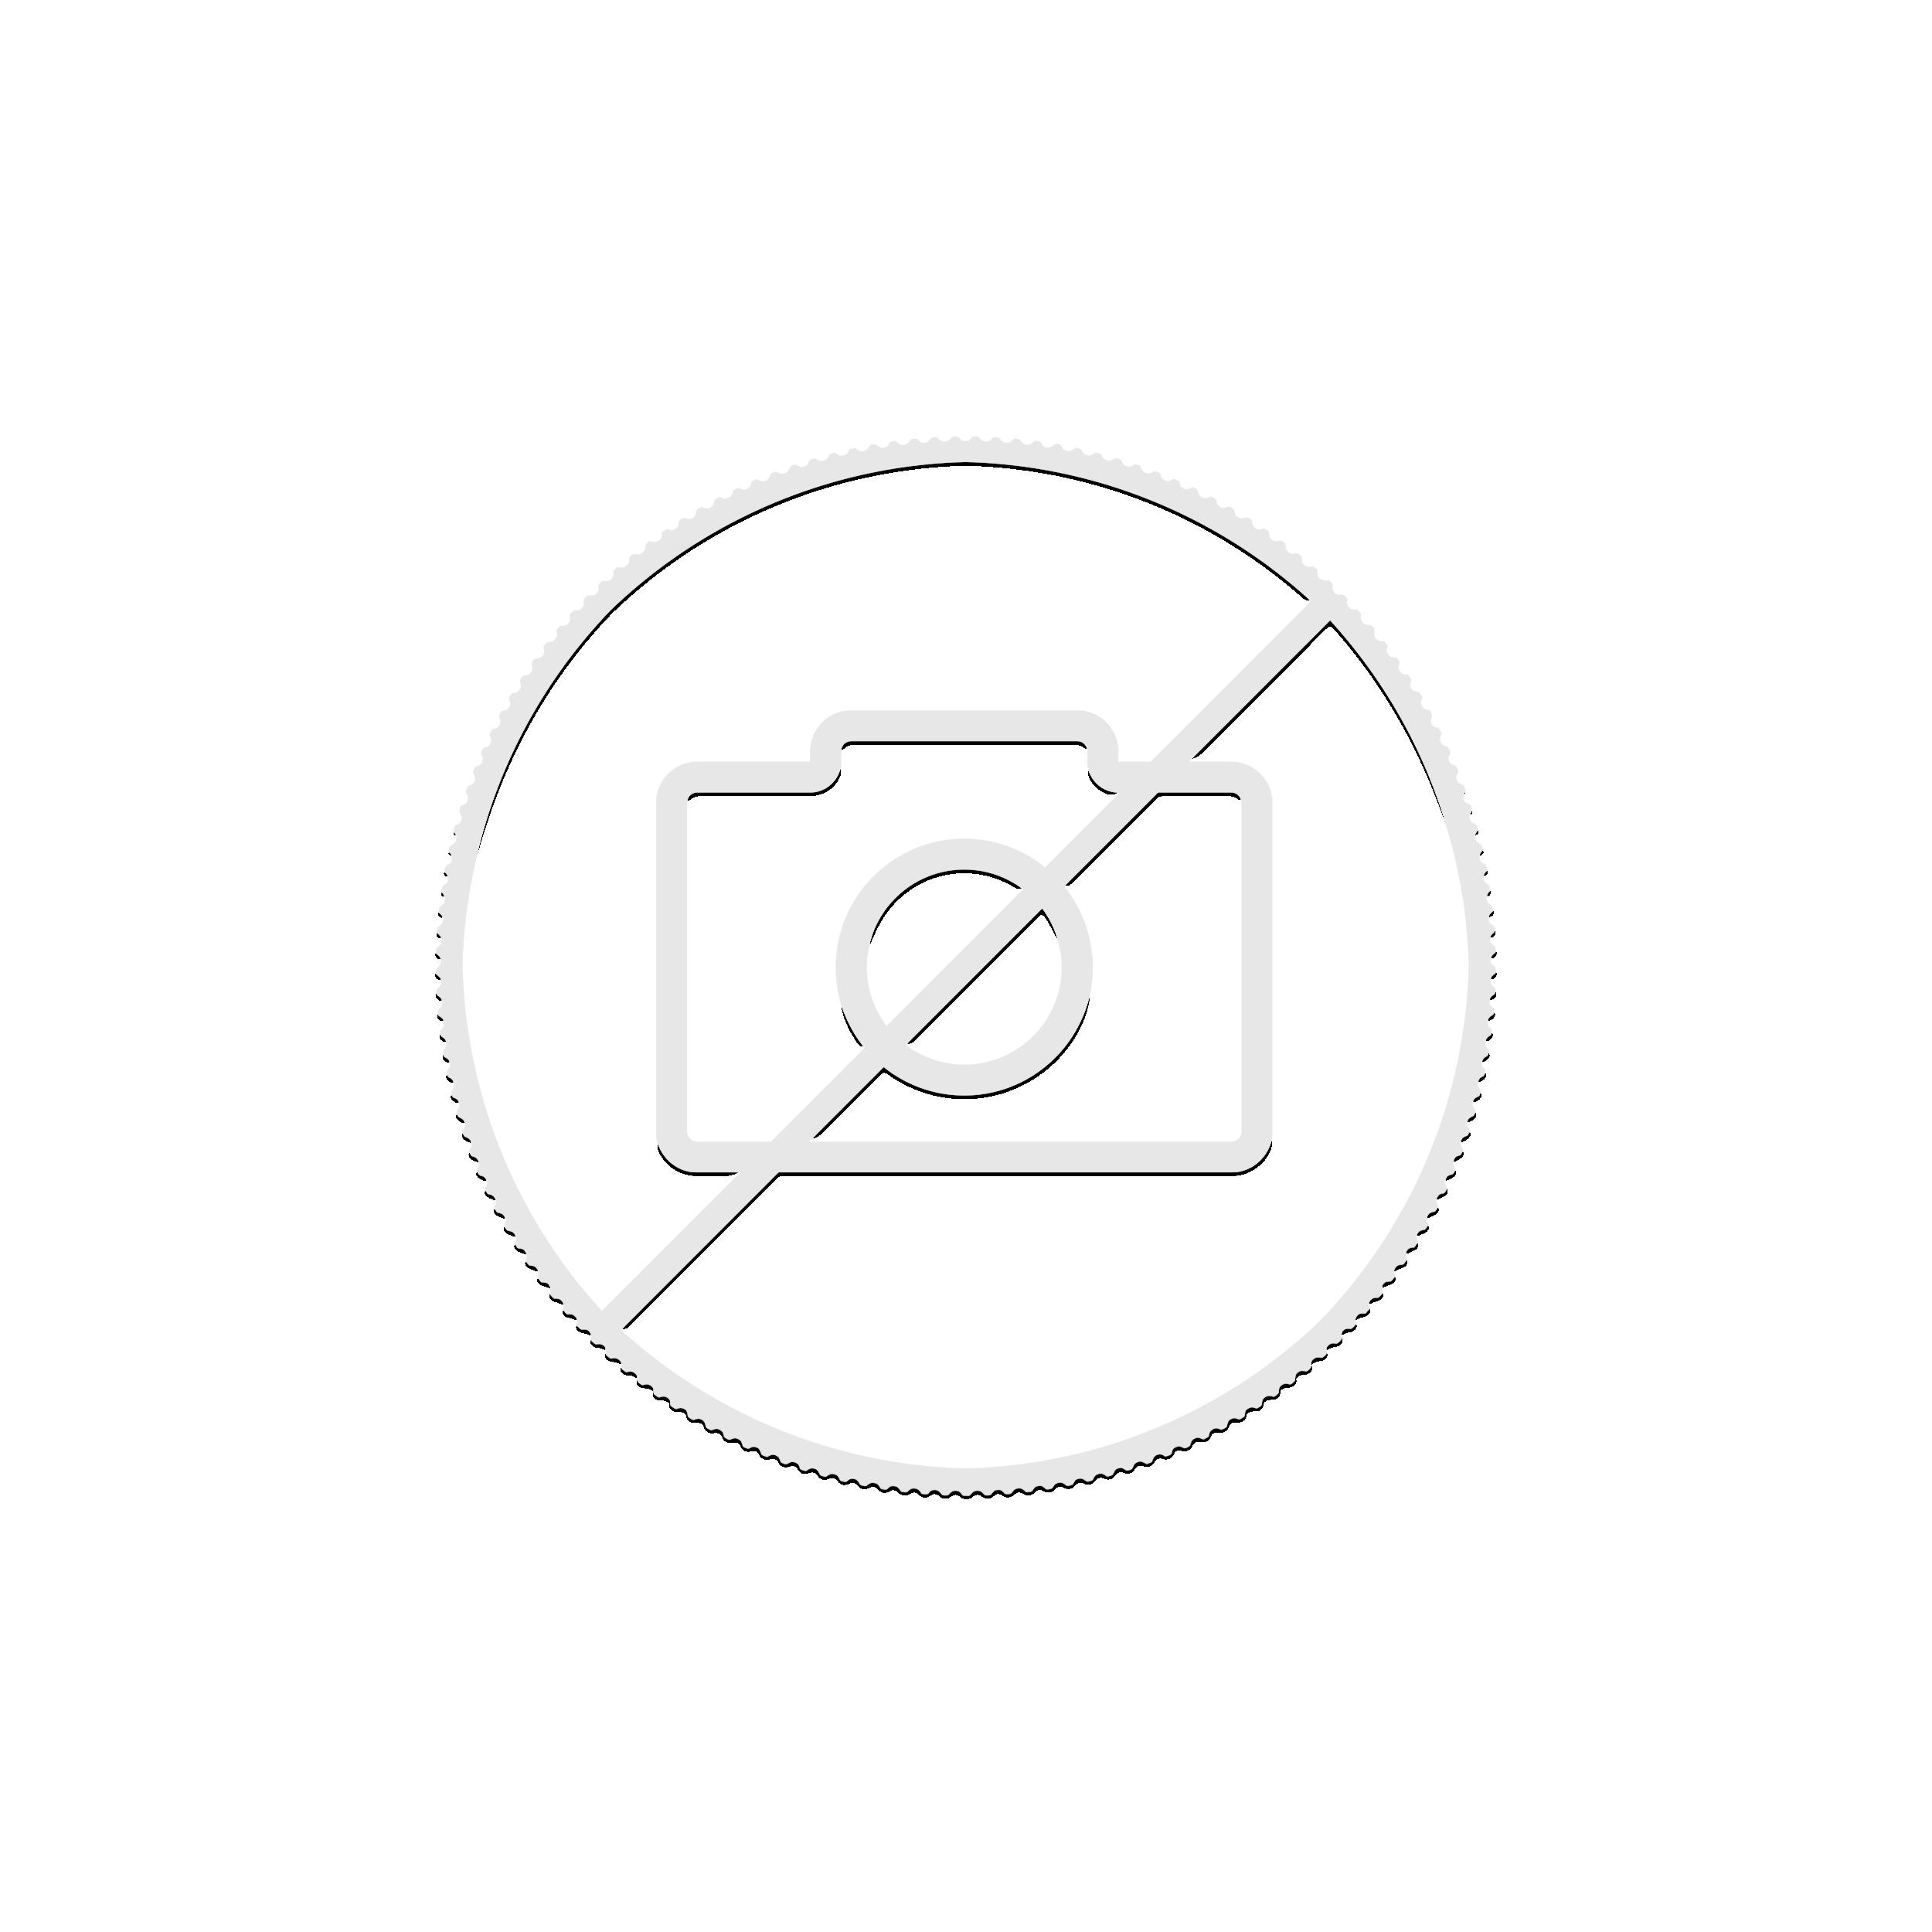 1 troy ounce gouden Panda munt 1990